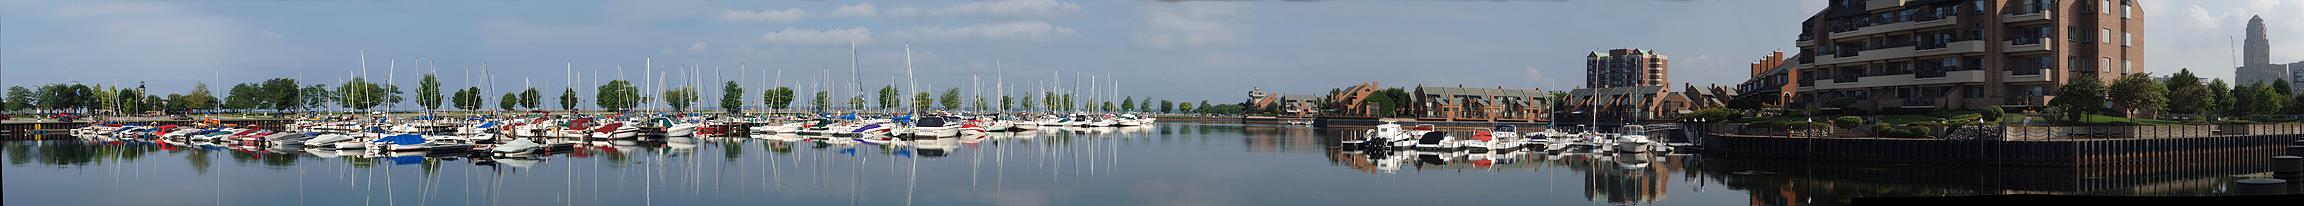 Erie_Basin_Marina_82508.jpg